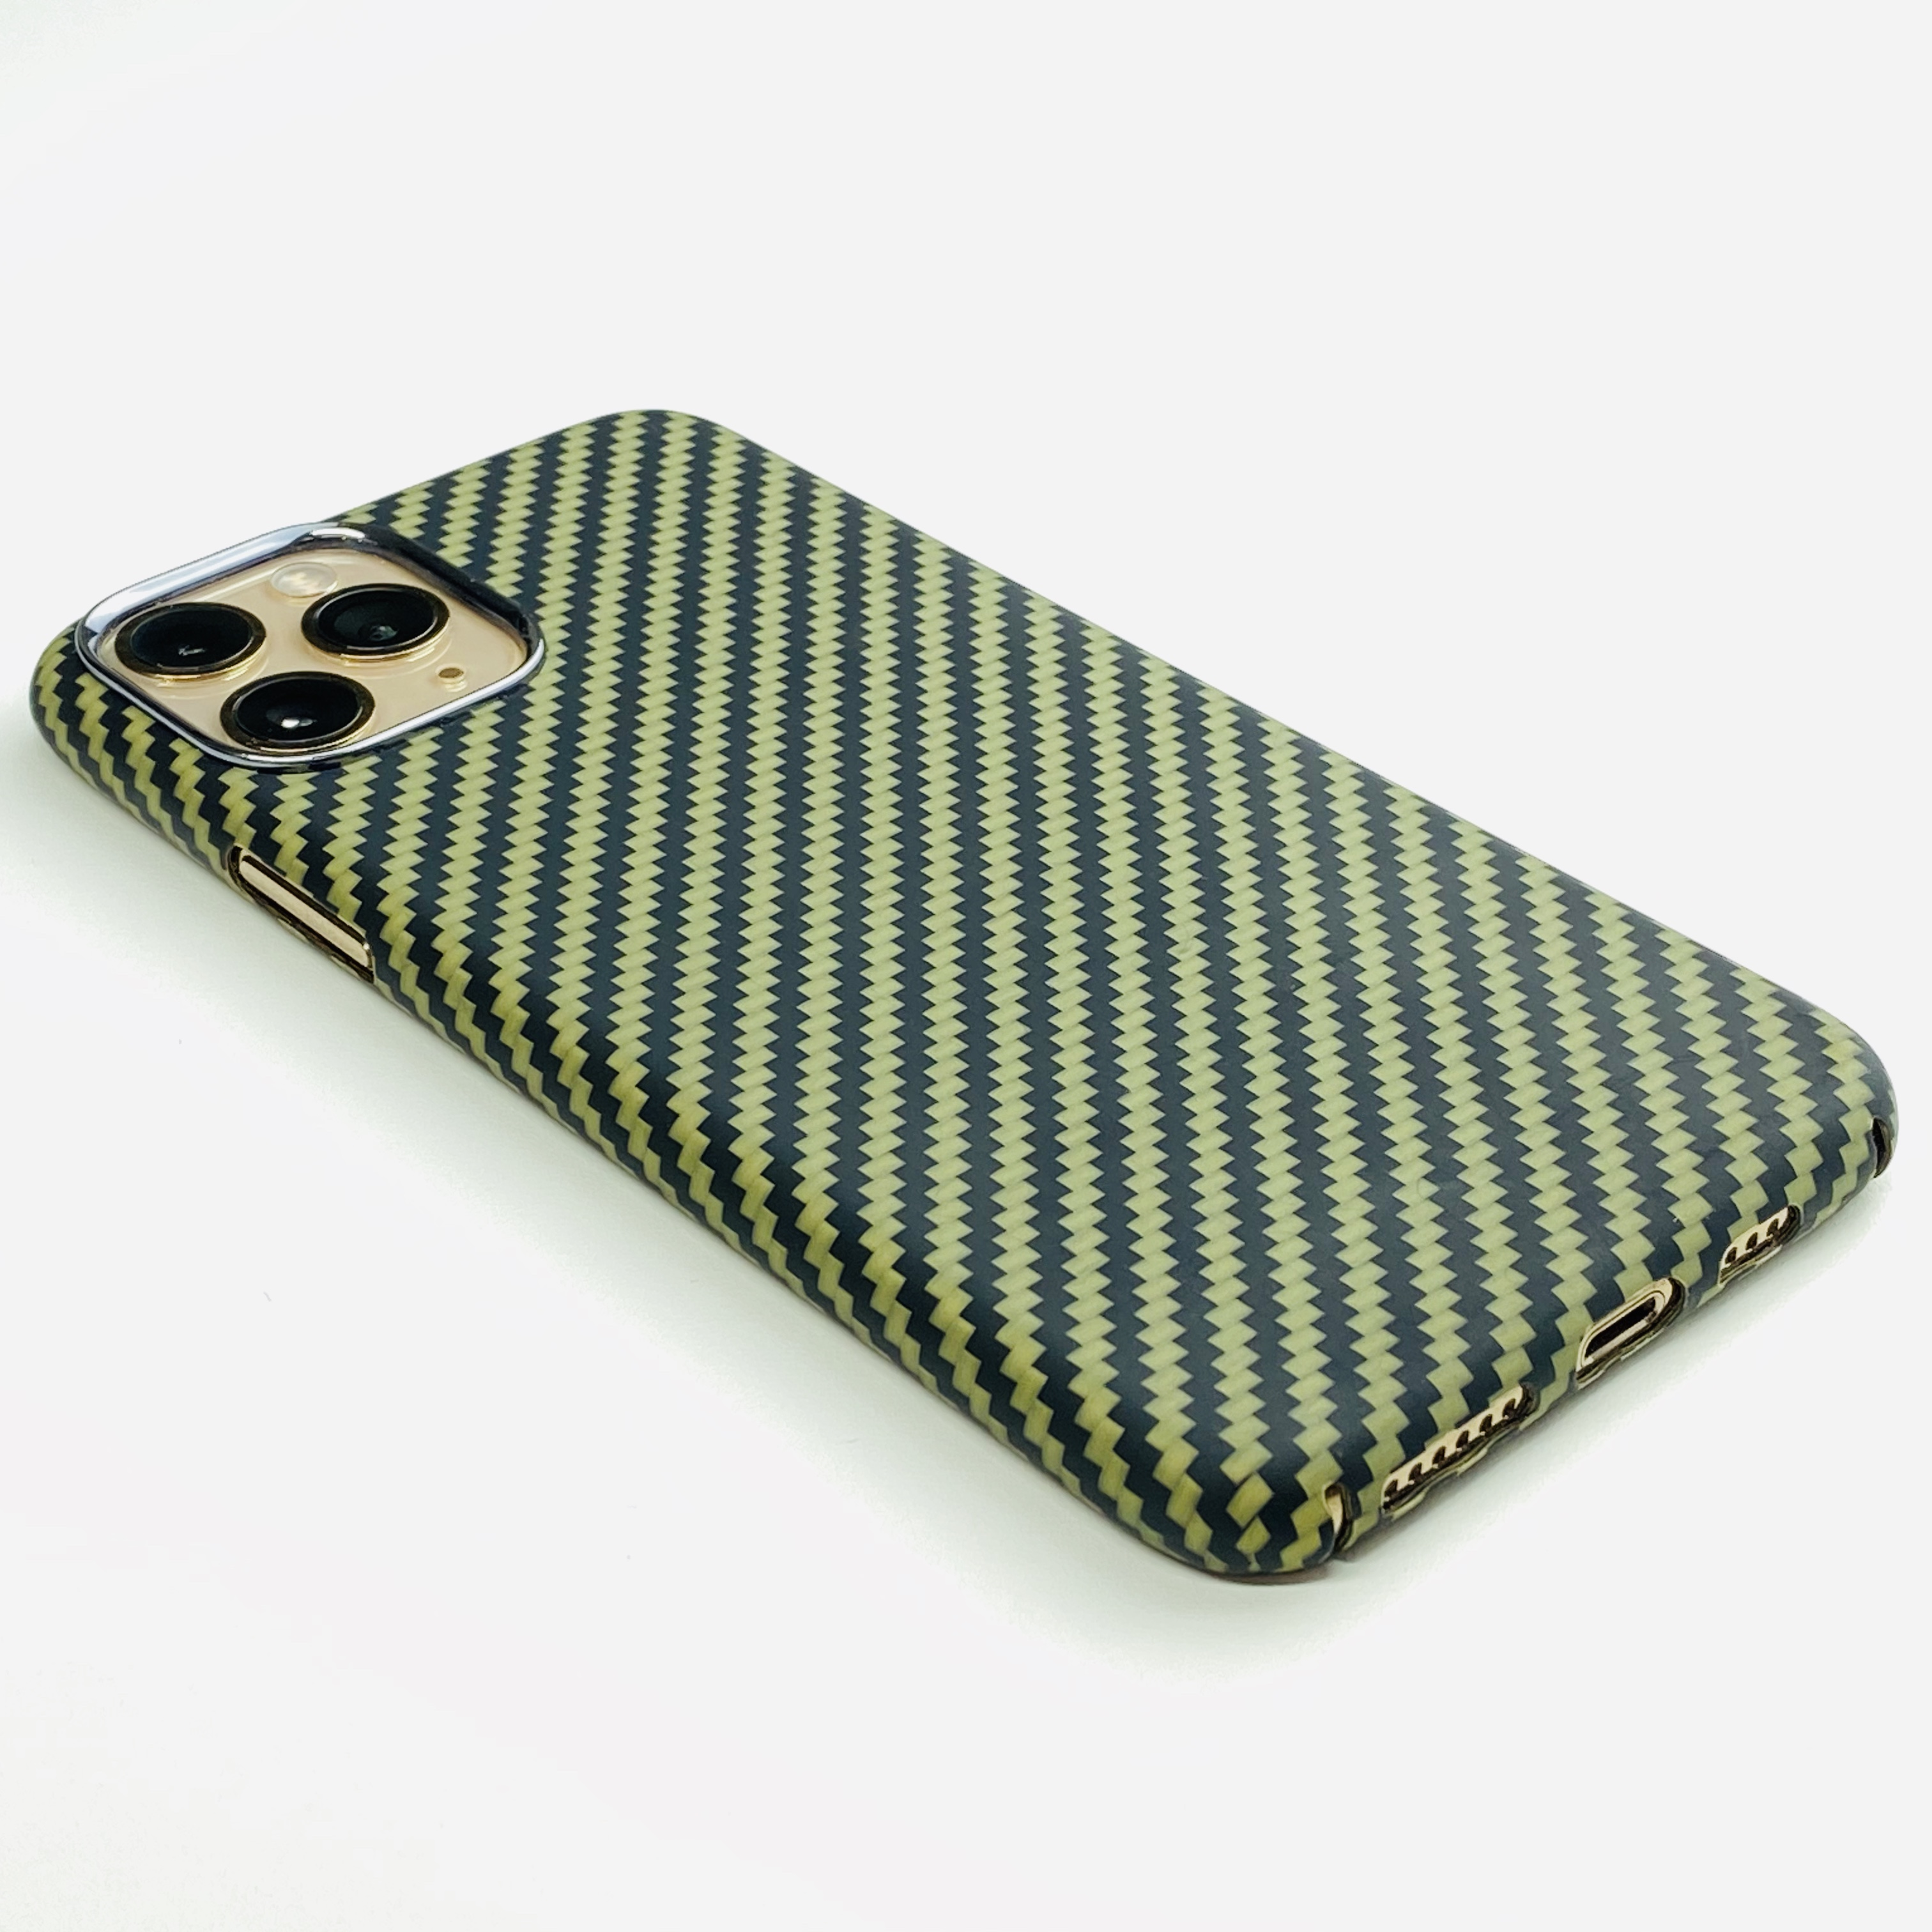 iPhone 11 Pro Max Armaid Case Special Edition grün schwarz